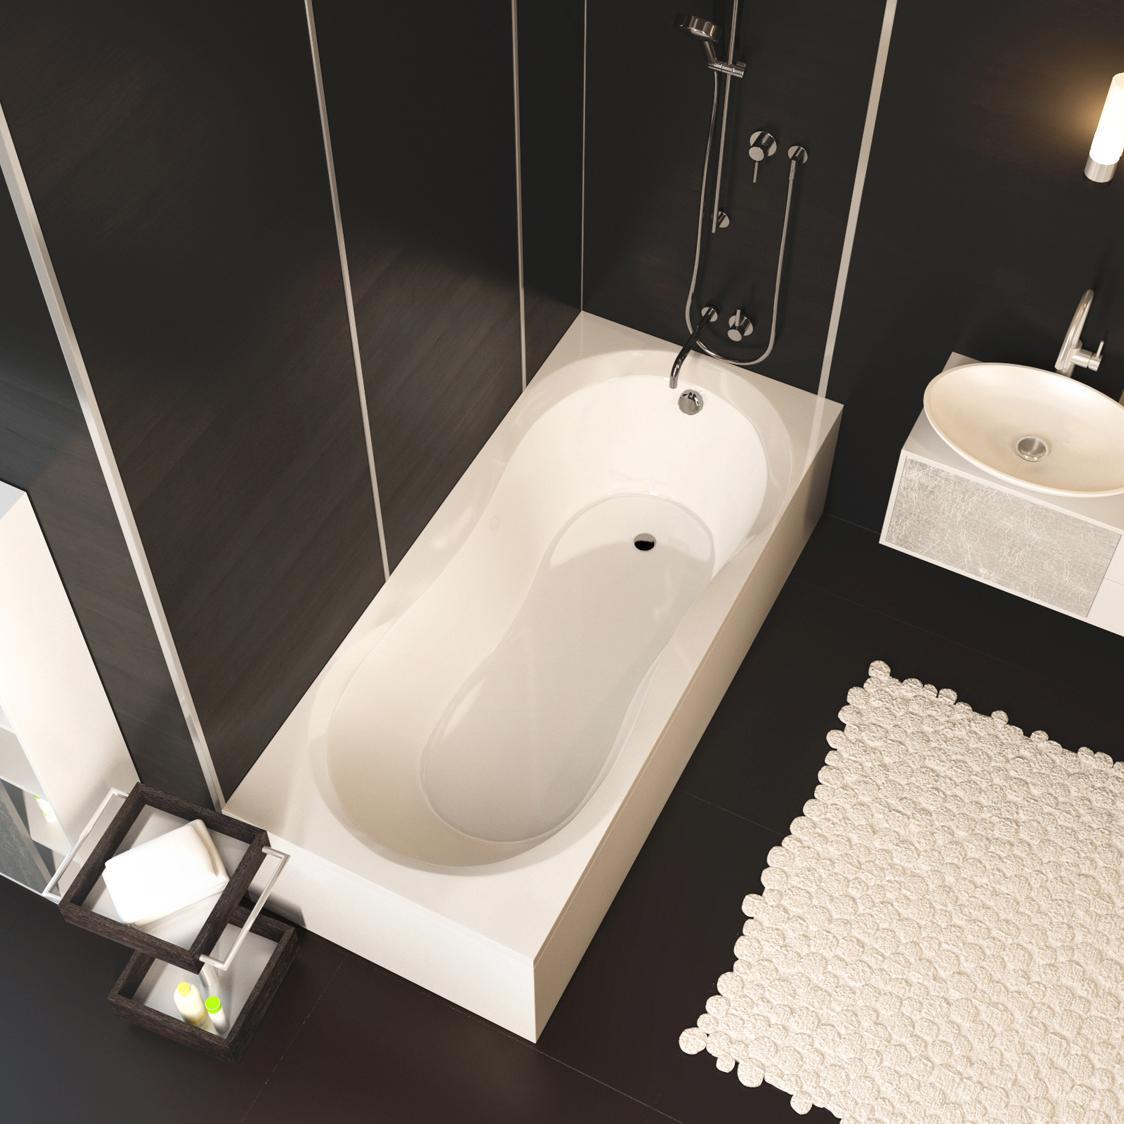 Акриловая ванна Alpen Mars 160x70 зажигалка zippo classic с покрытием meadow™